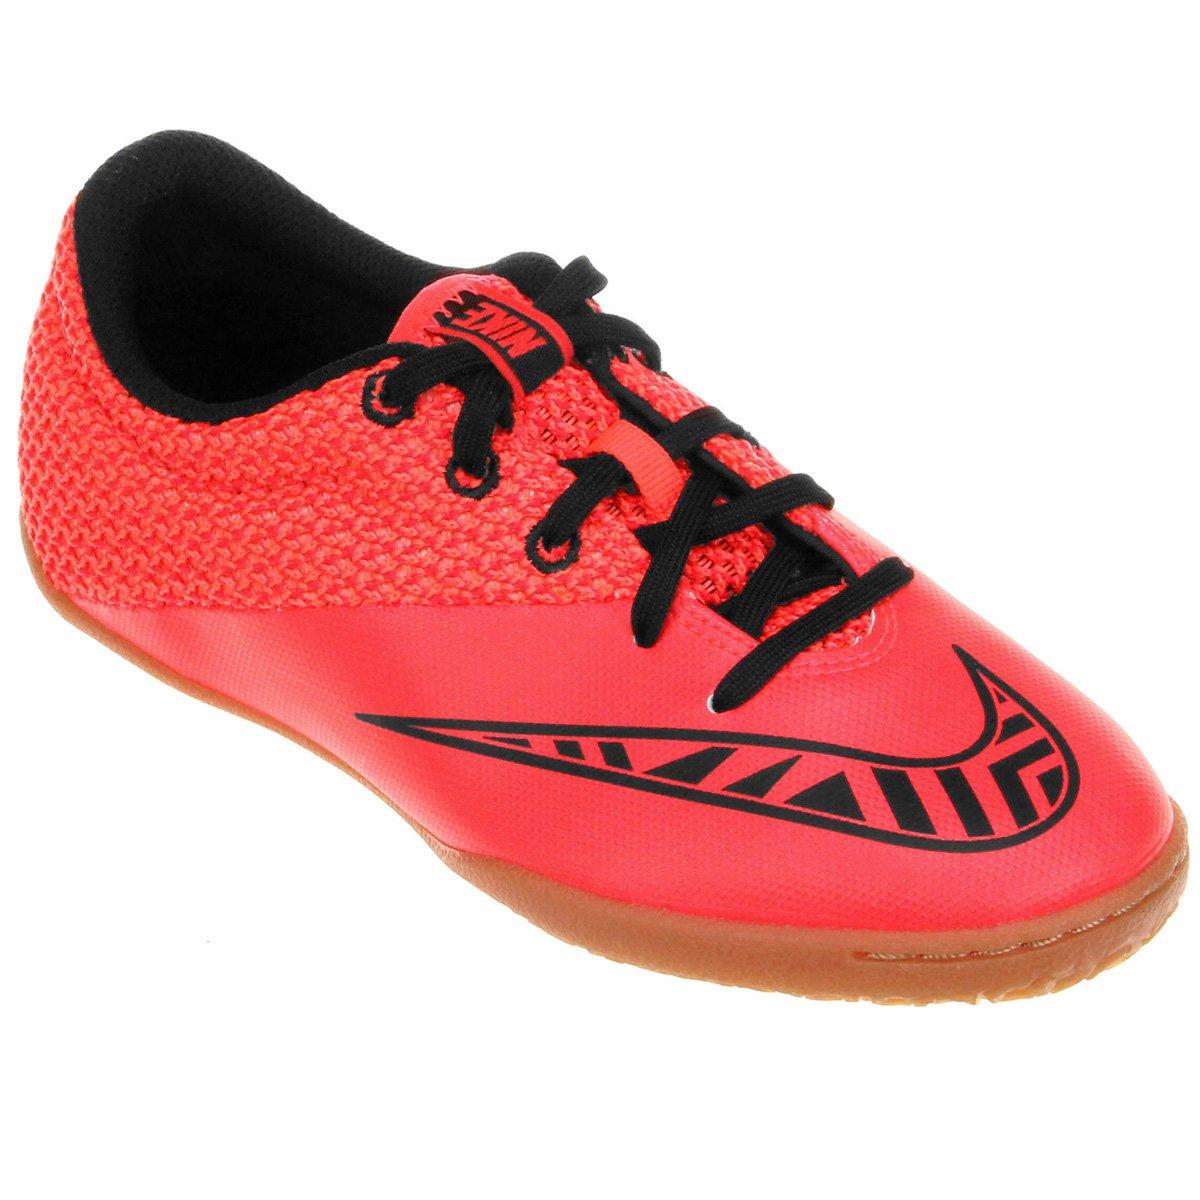 d6367a689a ... new arrivals chuteira nike mercurial pro ic futsal infantil compre  agora netshoes 2bd1c 9070d